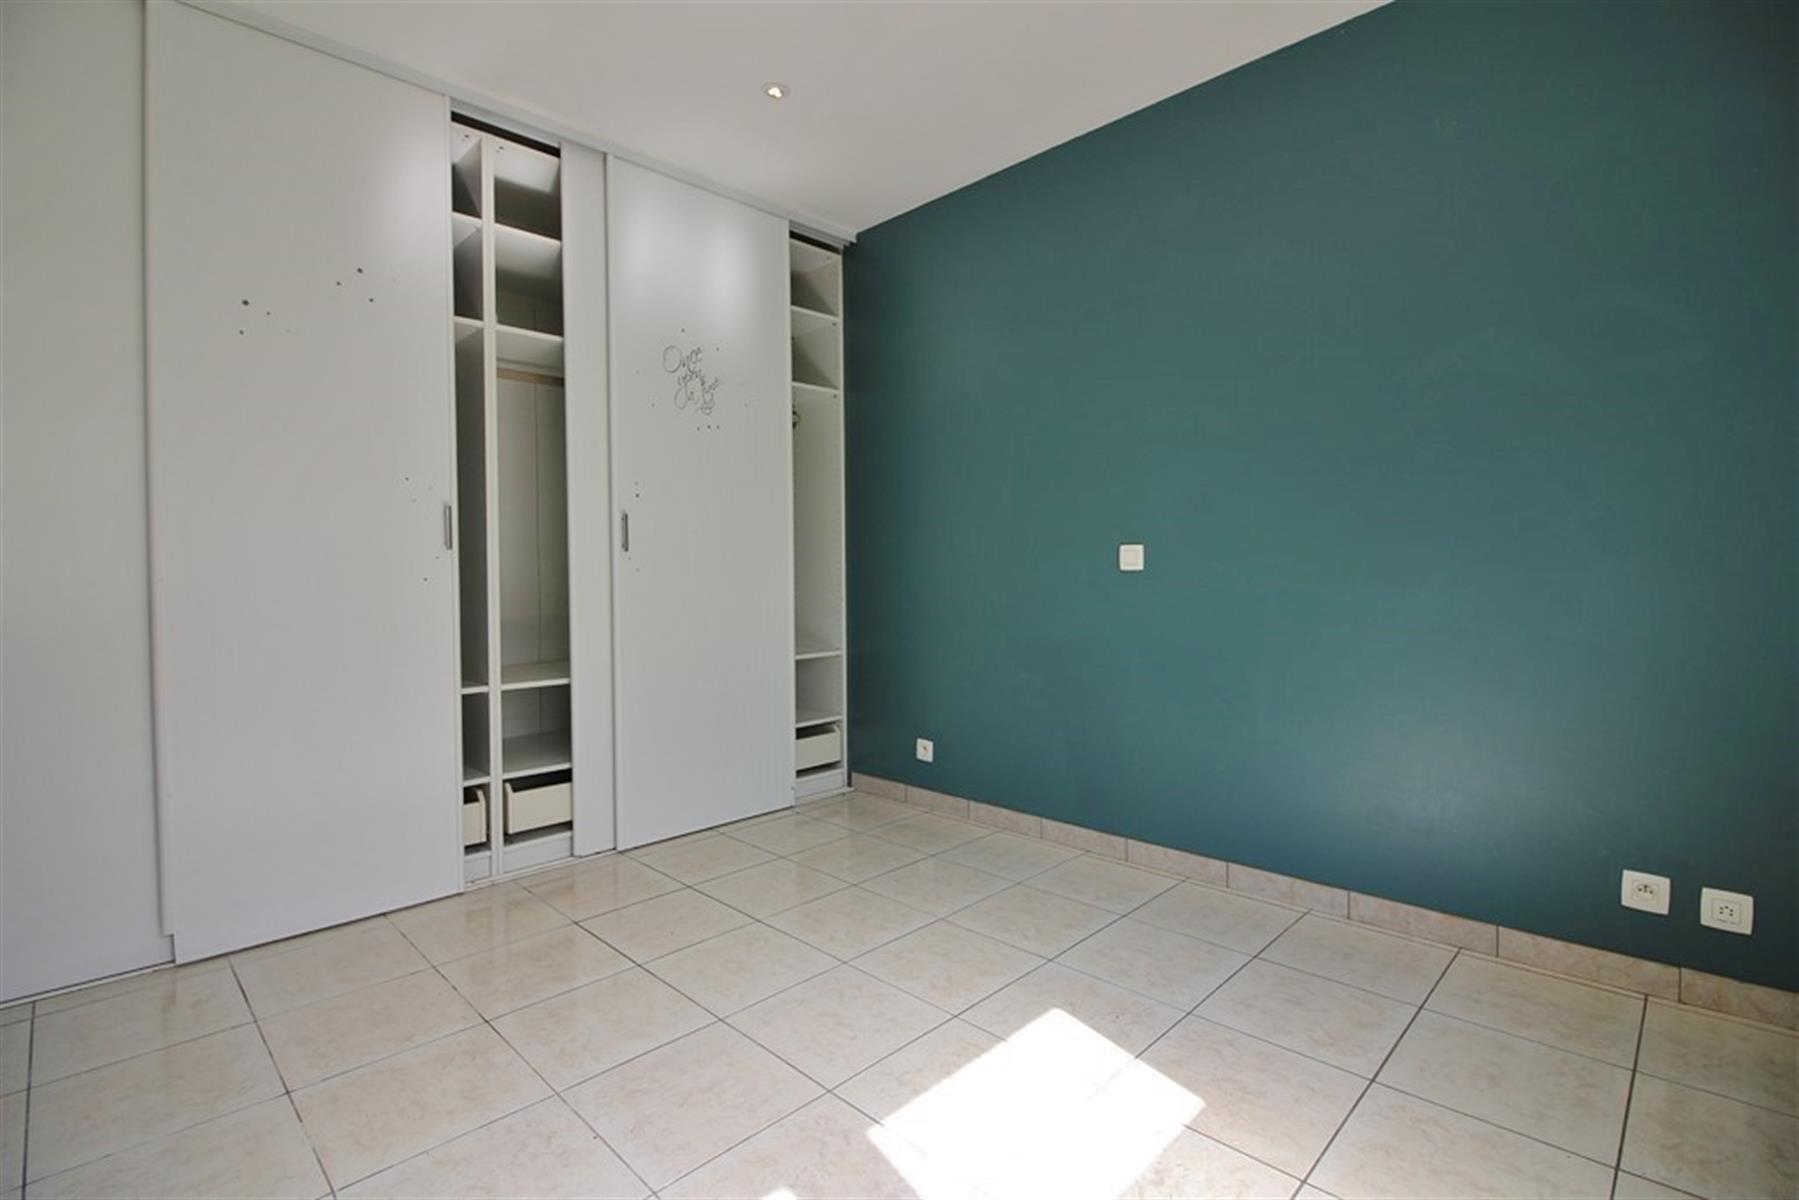 Maison - Herstal - #4350326-6